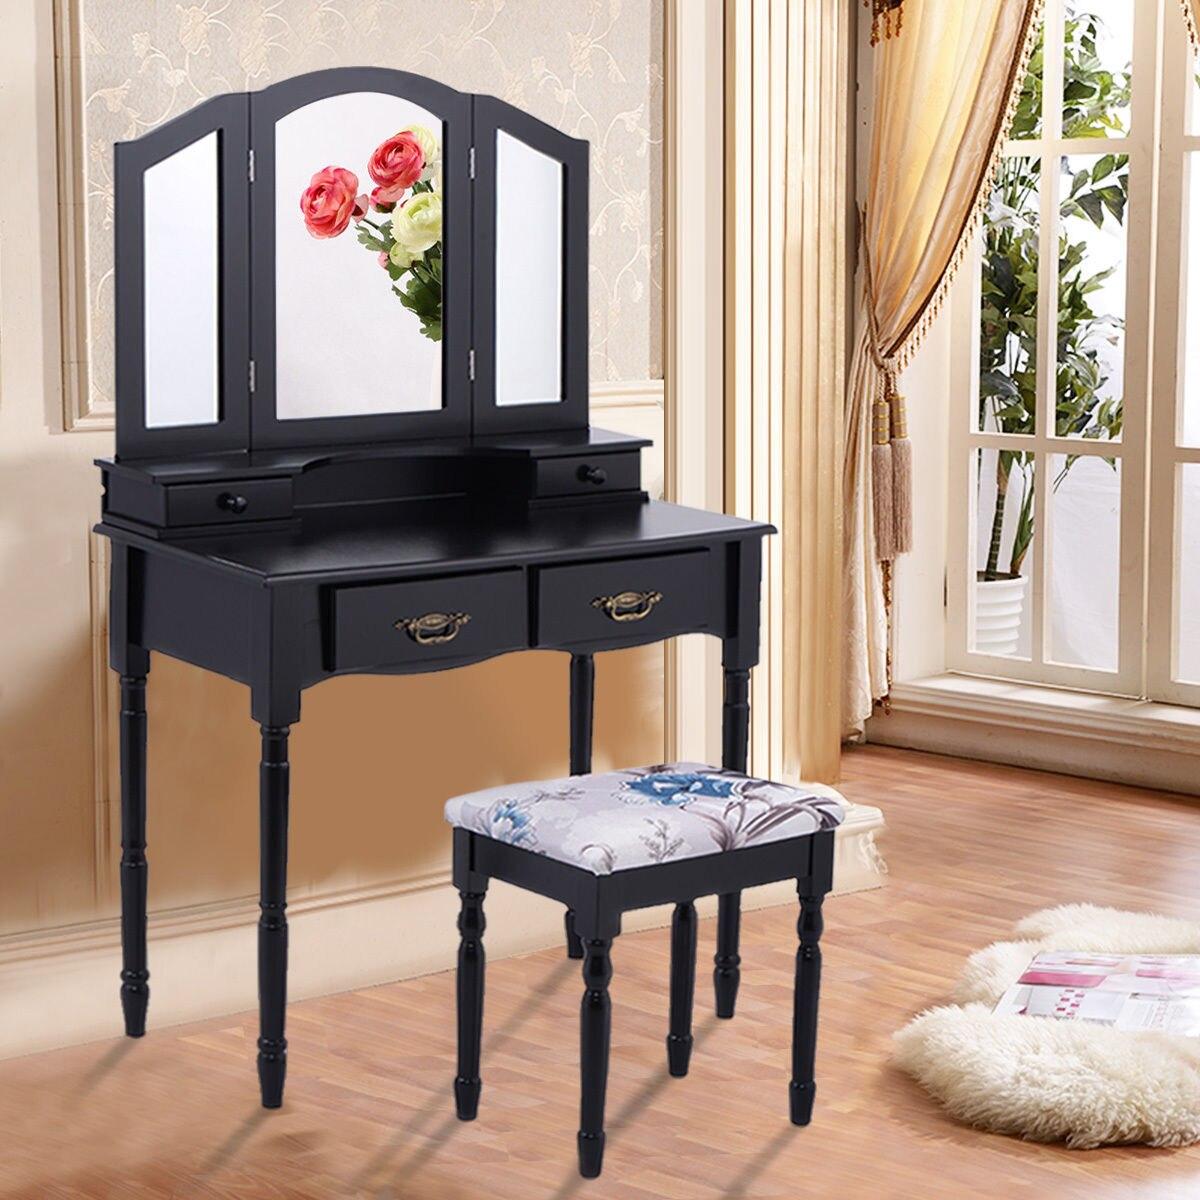 Giantex Black Tri Folding Mirror Vanity Makeup Table Stool